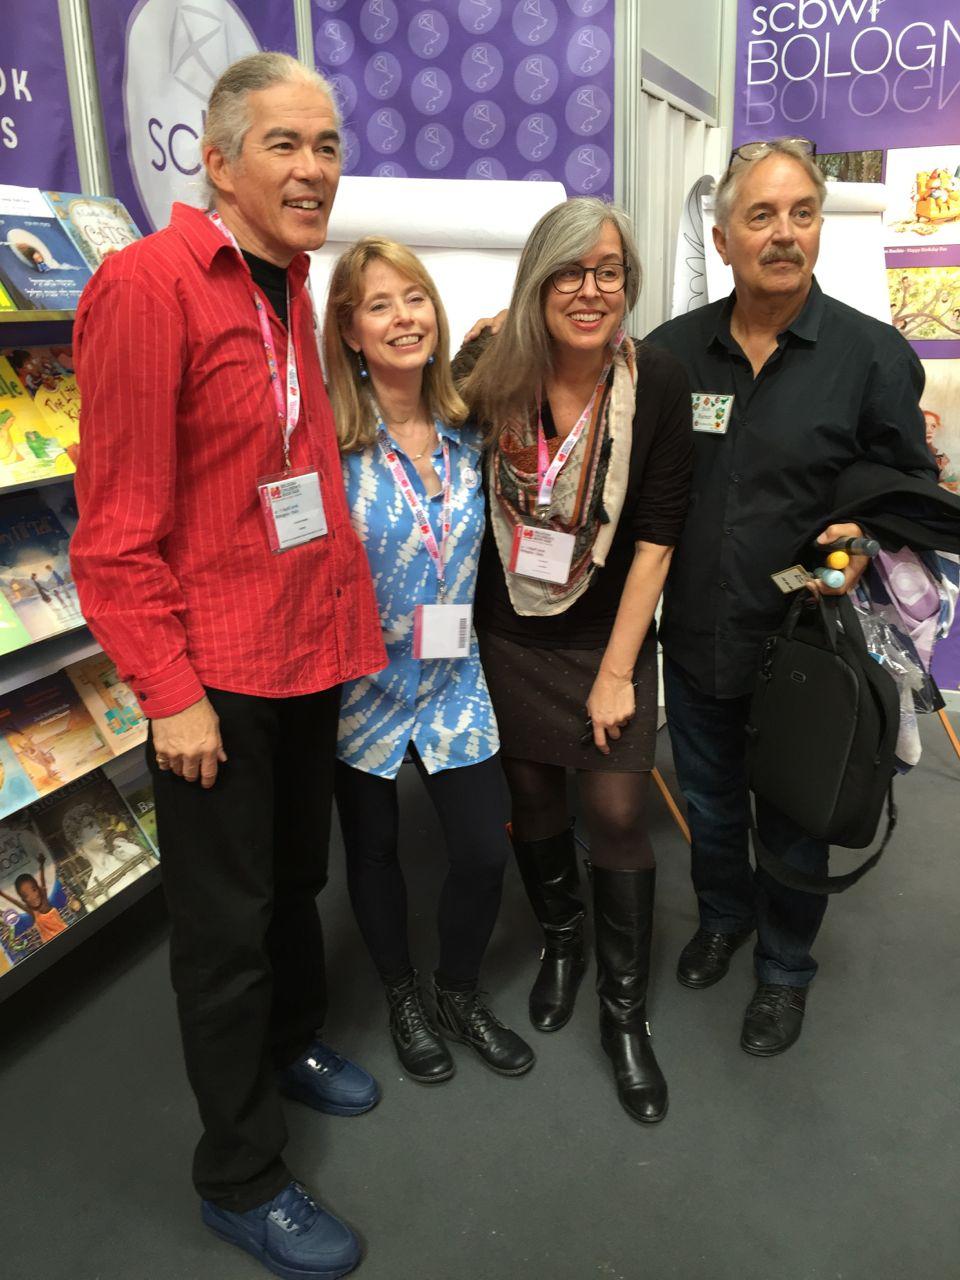 Chris, me, Elizabeth, Bob Barner